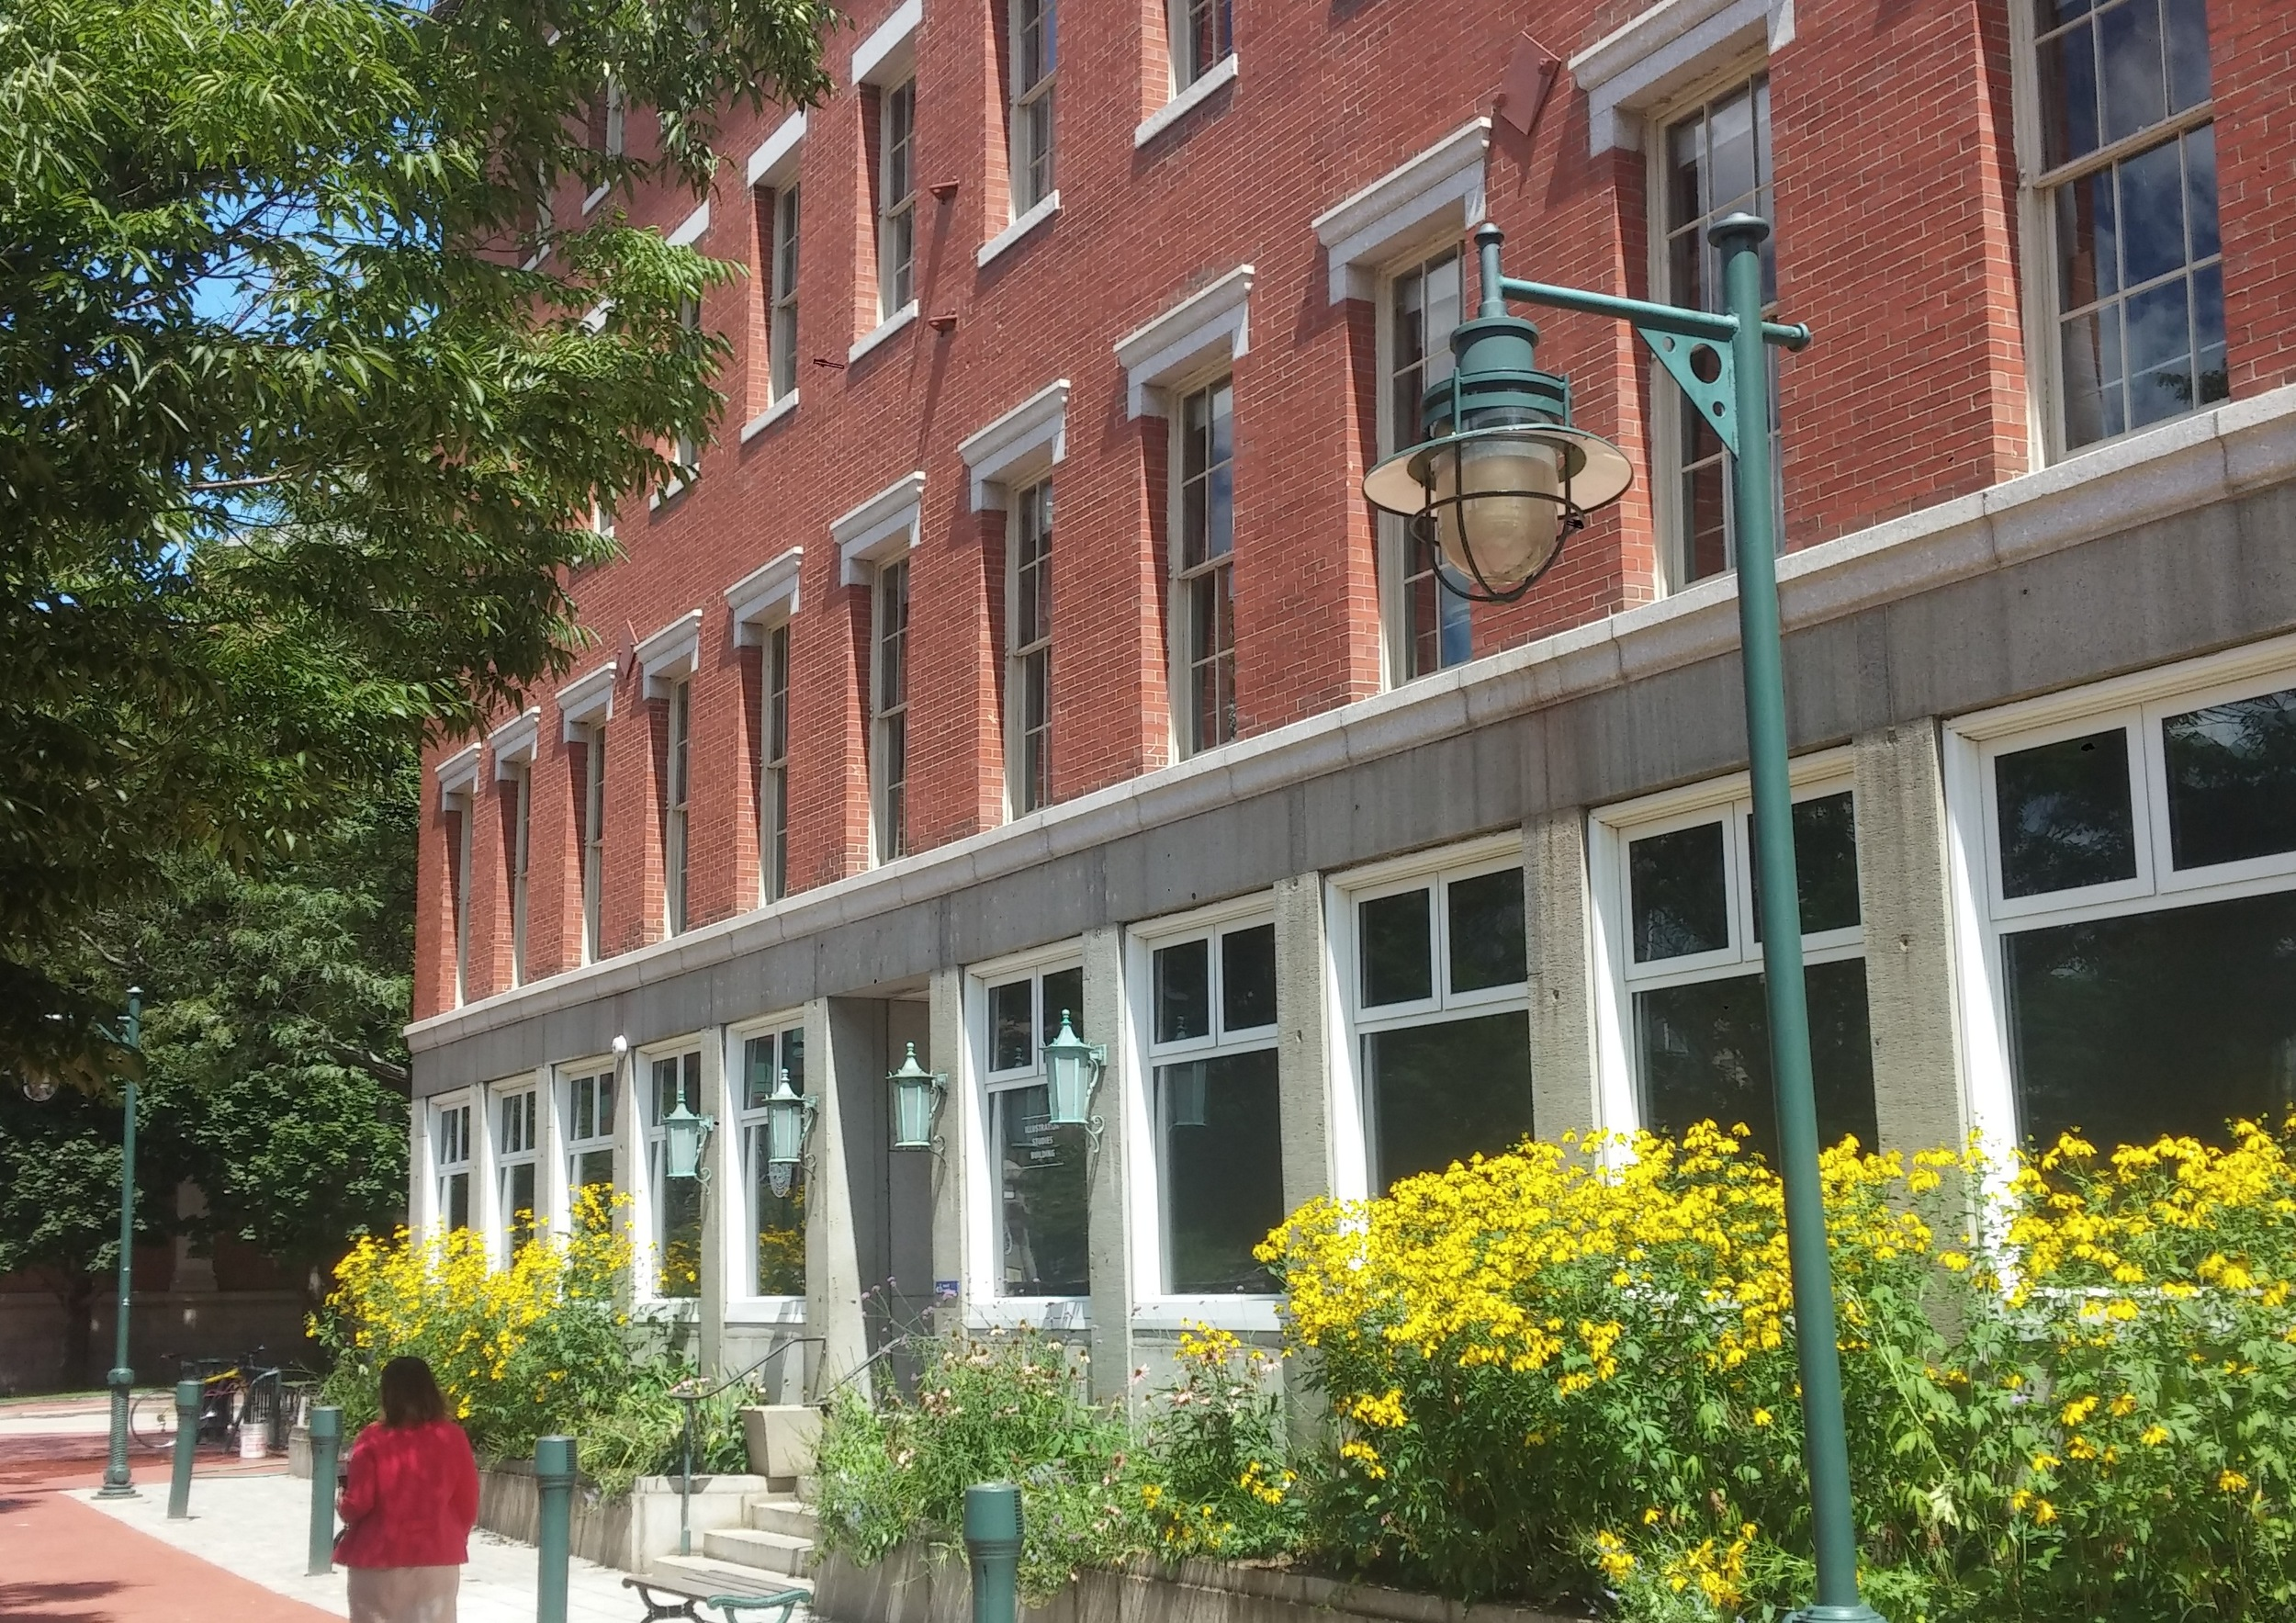 The historic, many-windowed ISB building at RISD. (Kevin Proft/ecoRI News)